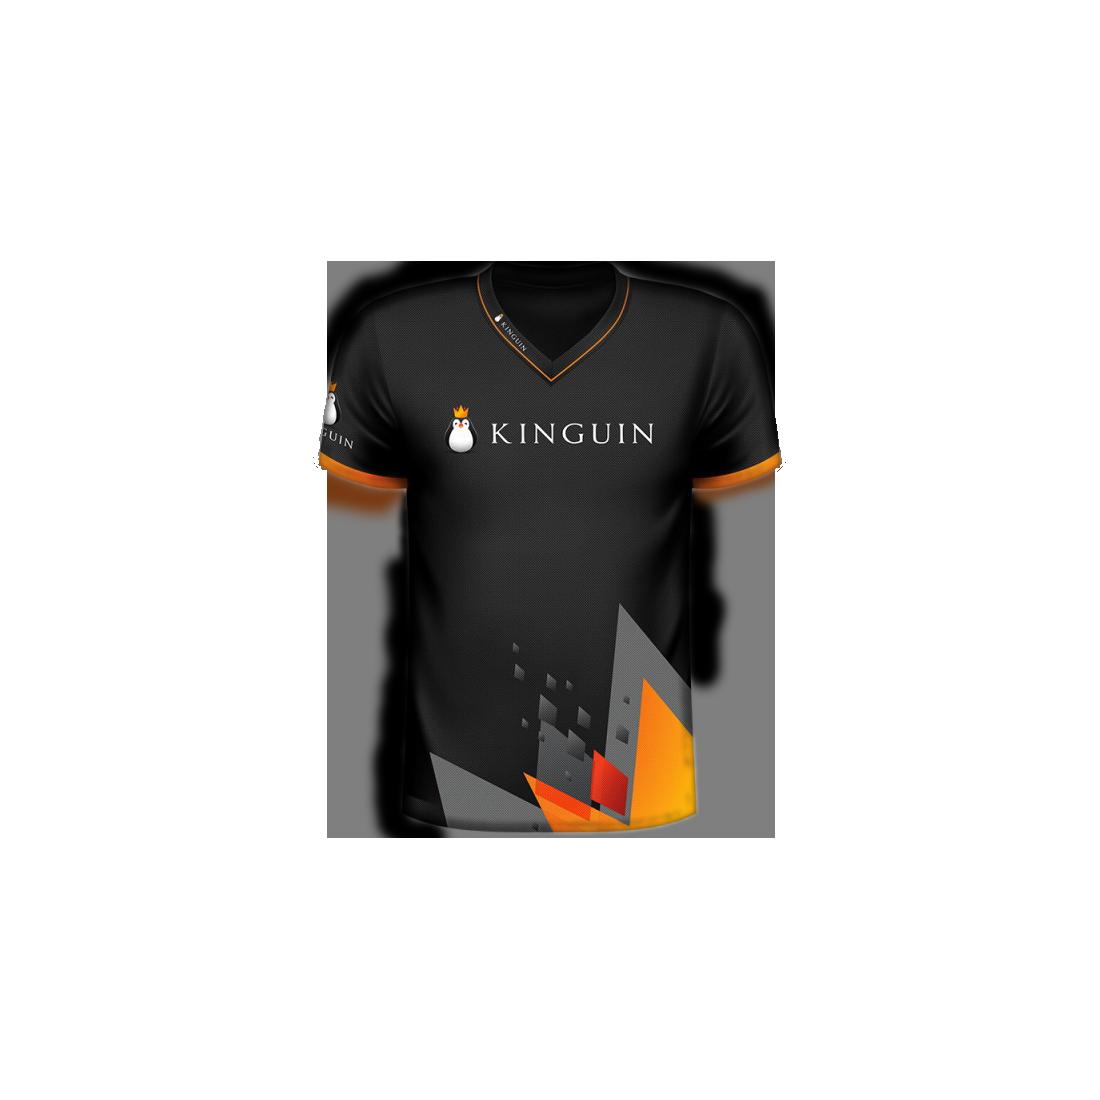 Koszulka Kinguin - rozmiar XL